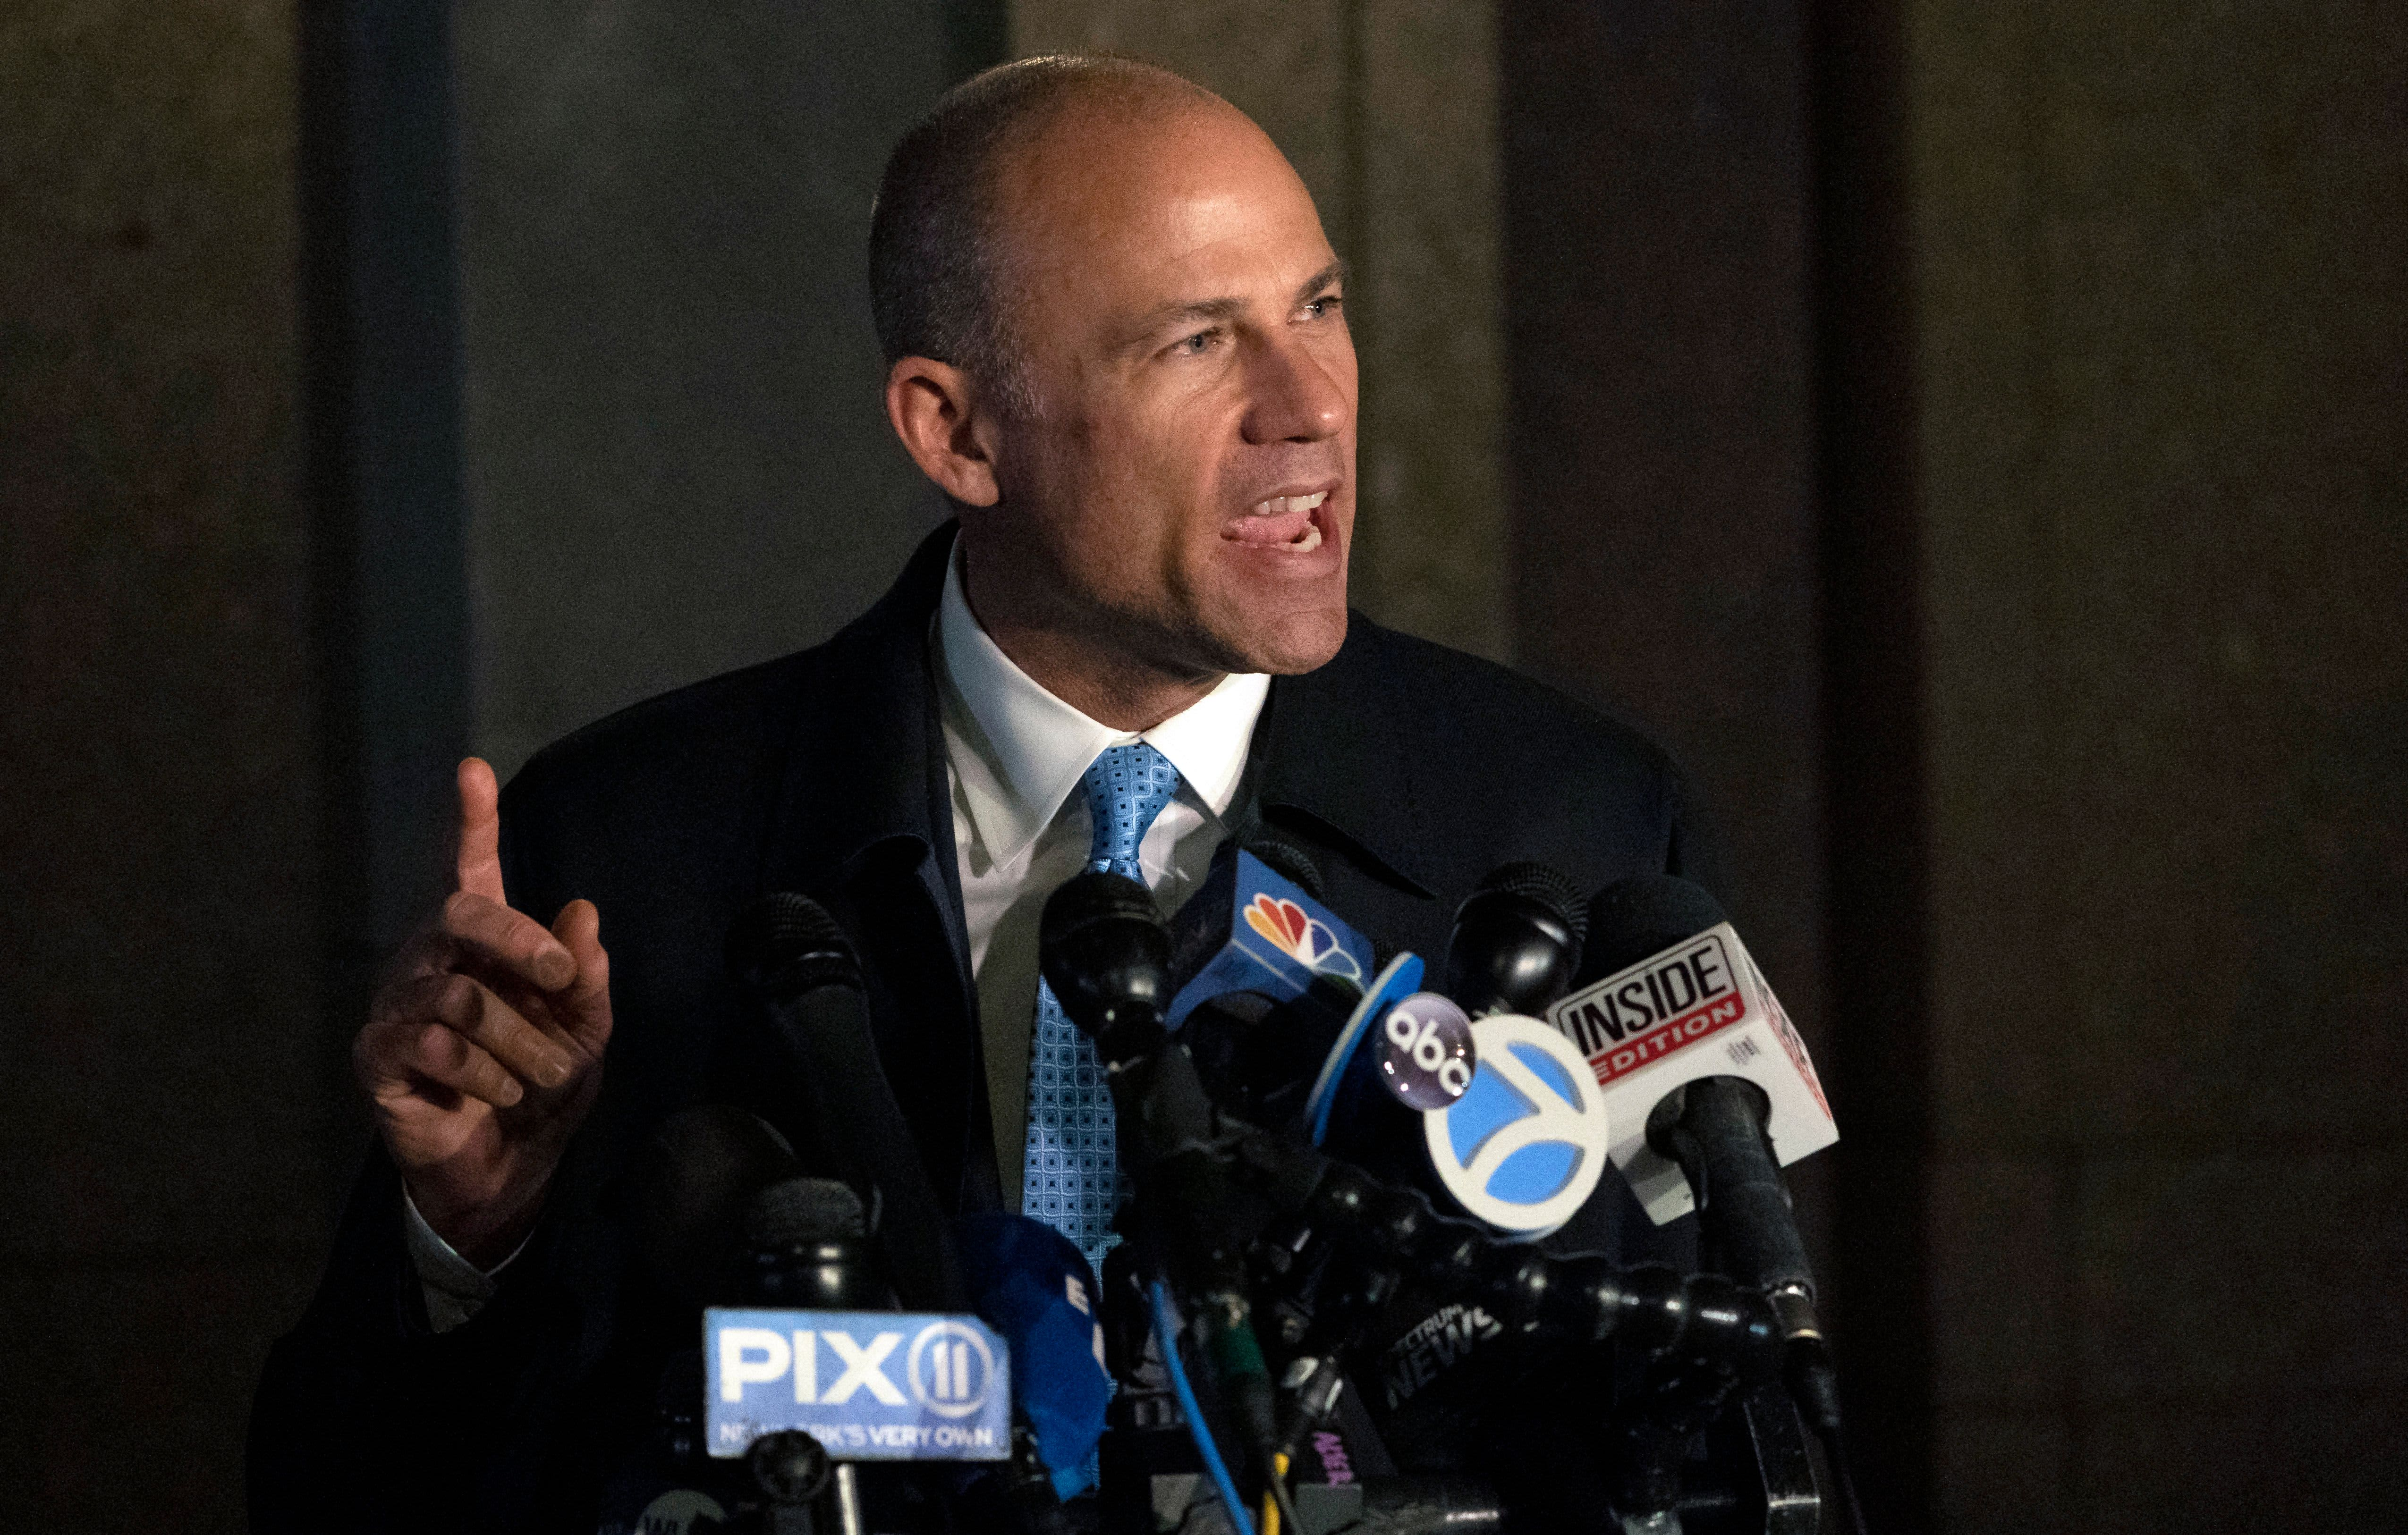 Michael Avenatti is accused in alleged $20 million scheme against Nike